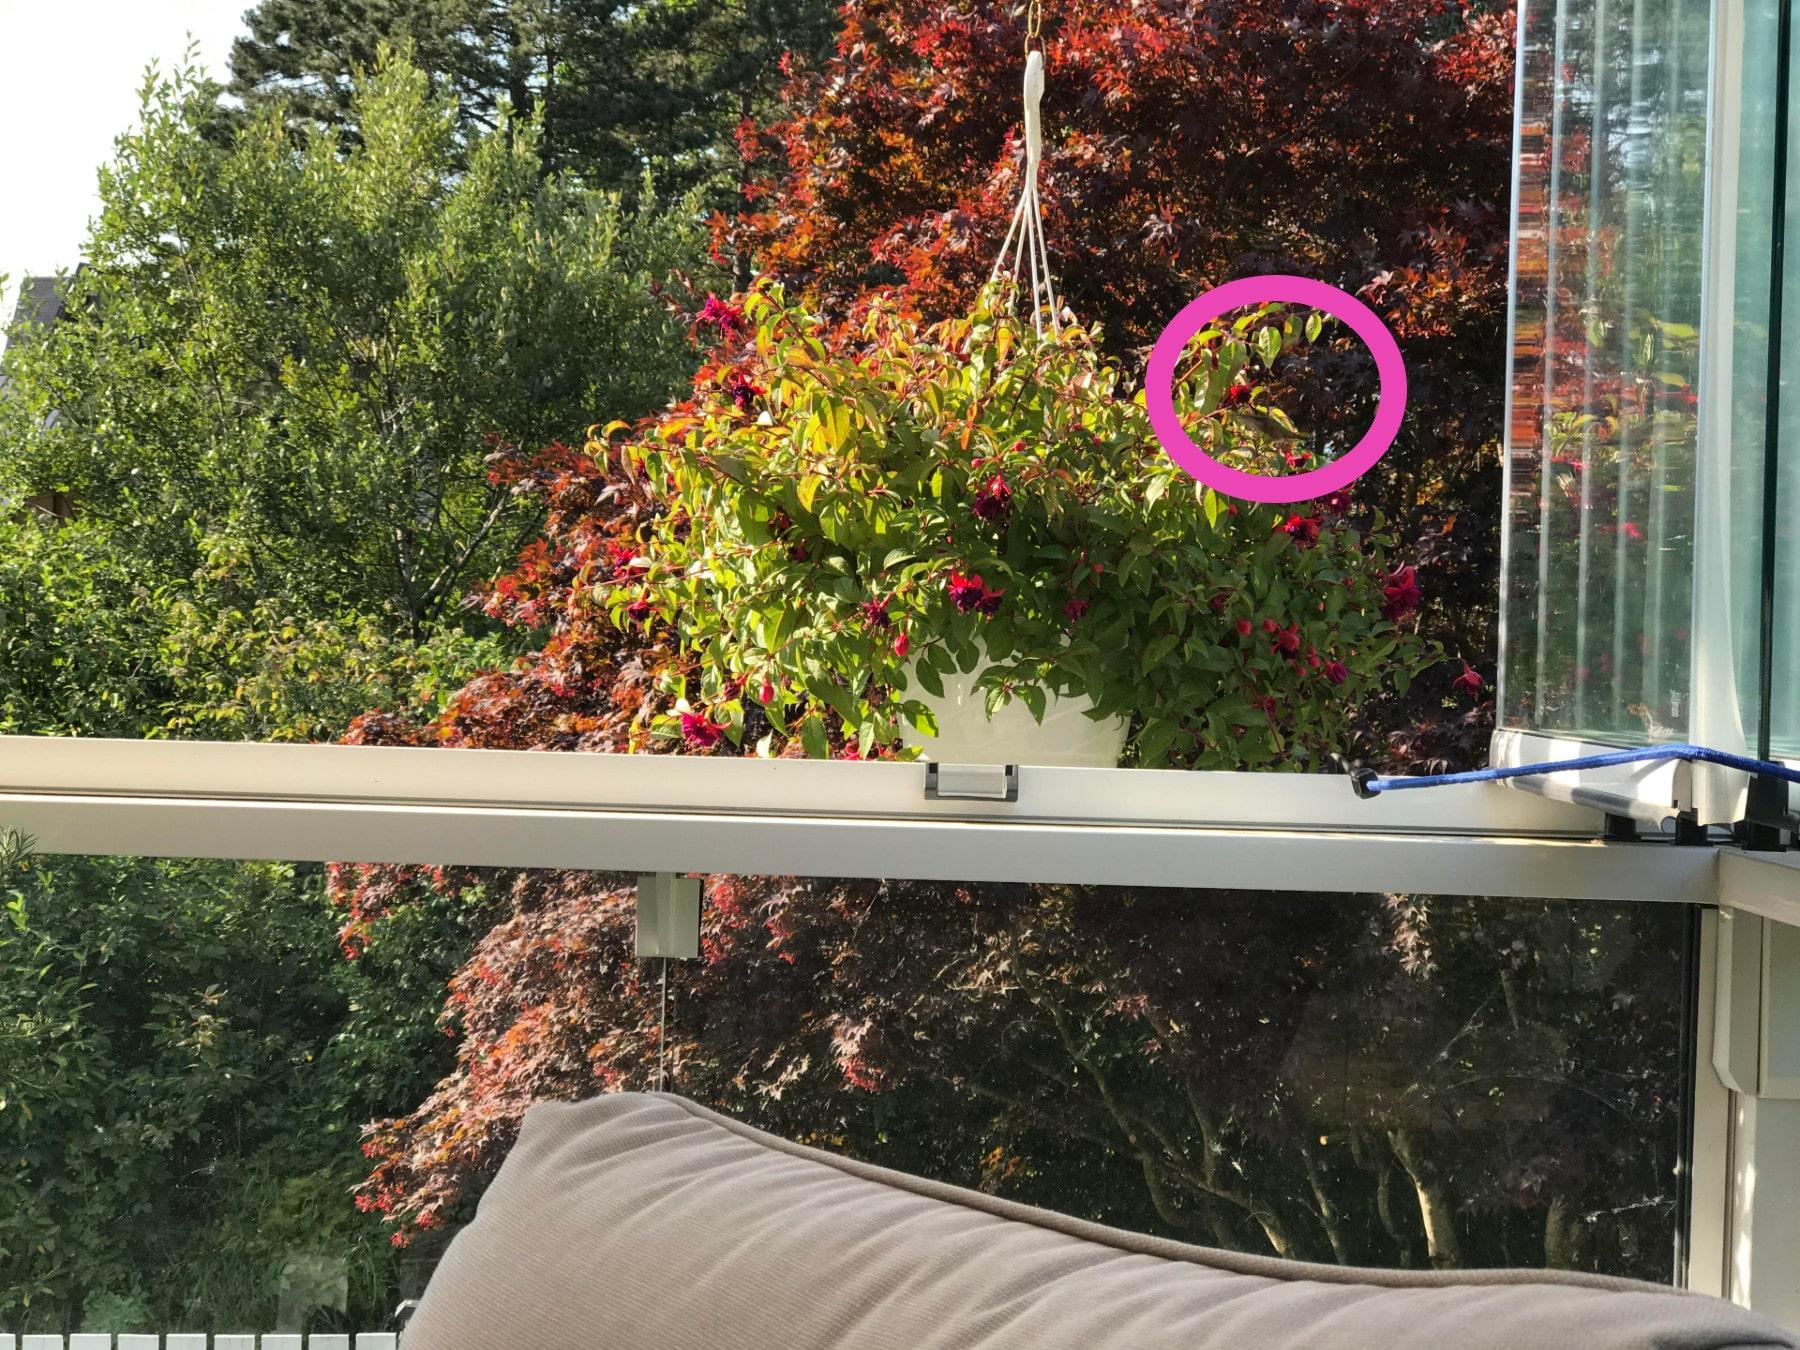 colibrí, reto viral, jardín, acertijo